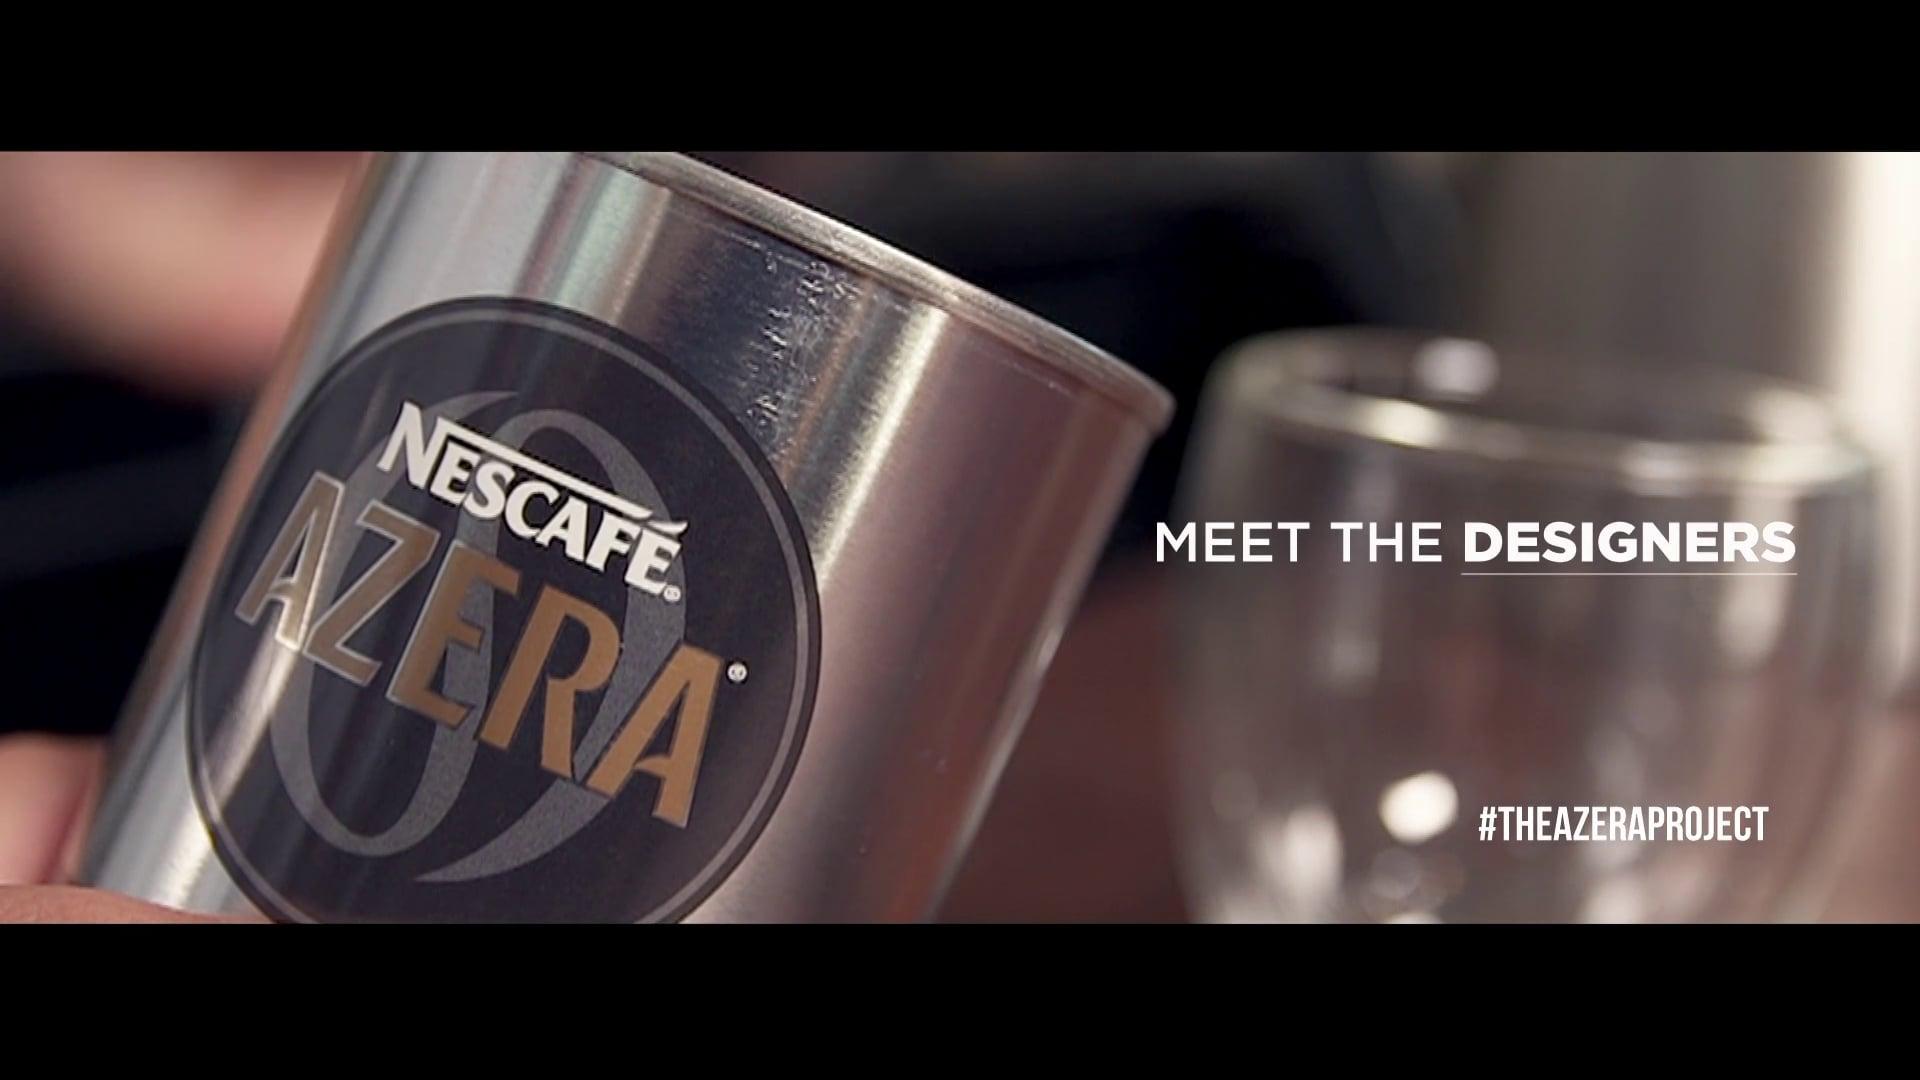 Nescafe 'The Azera Project'